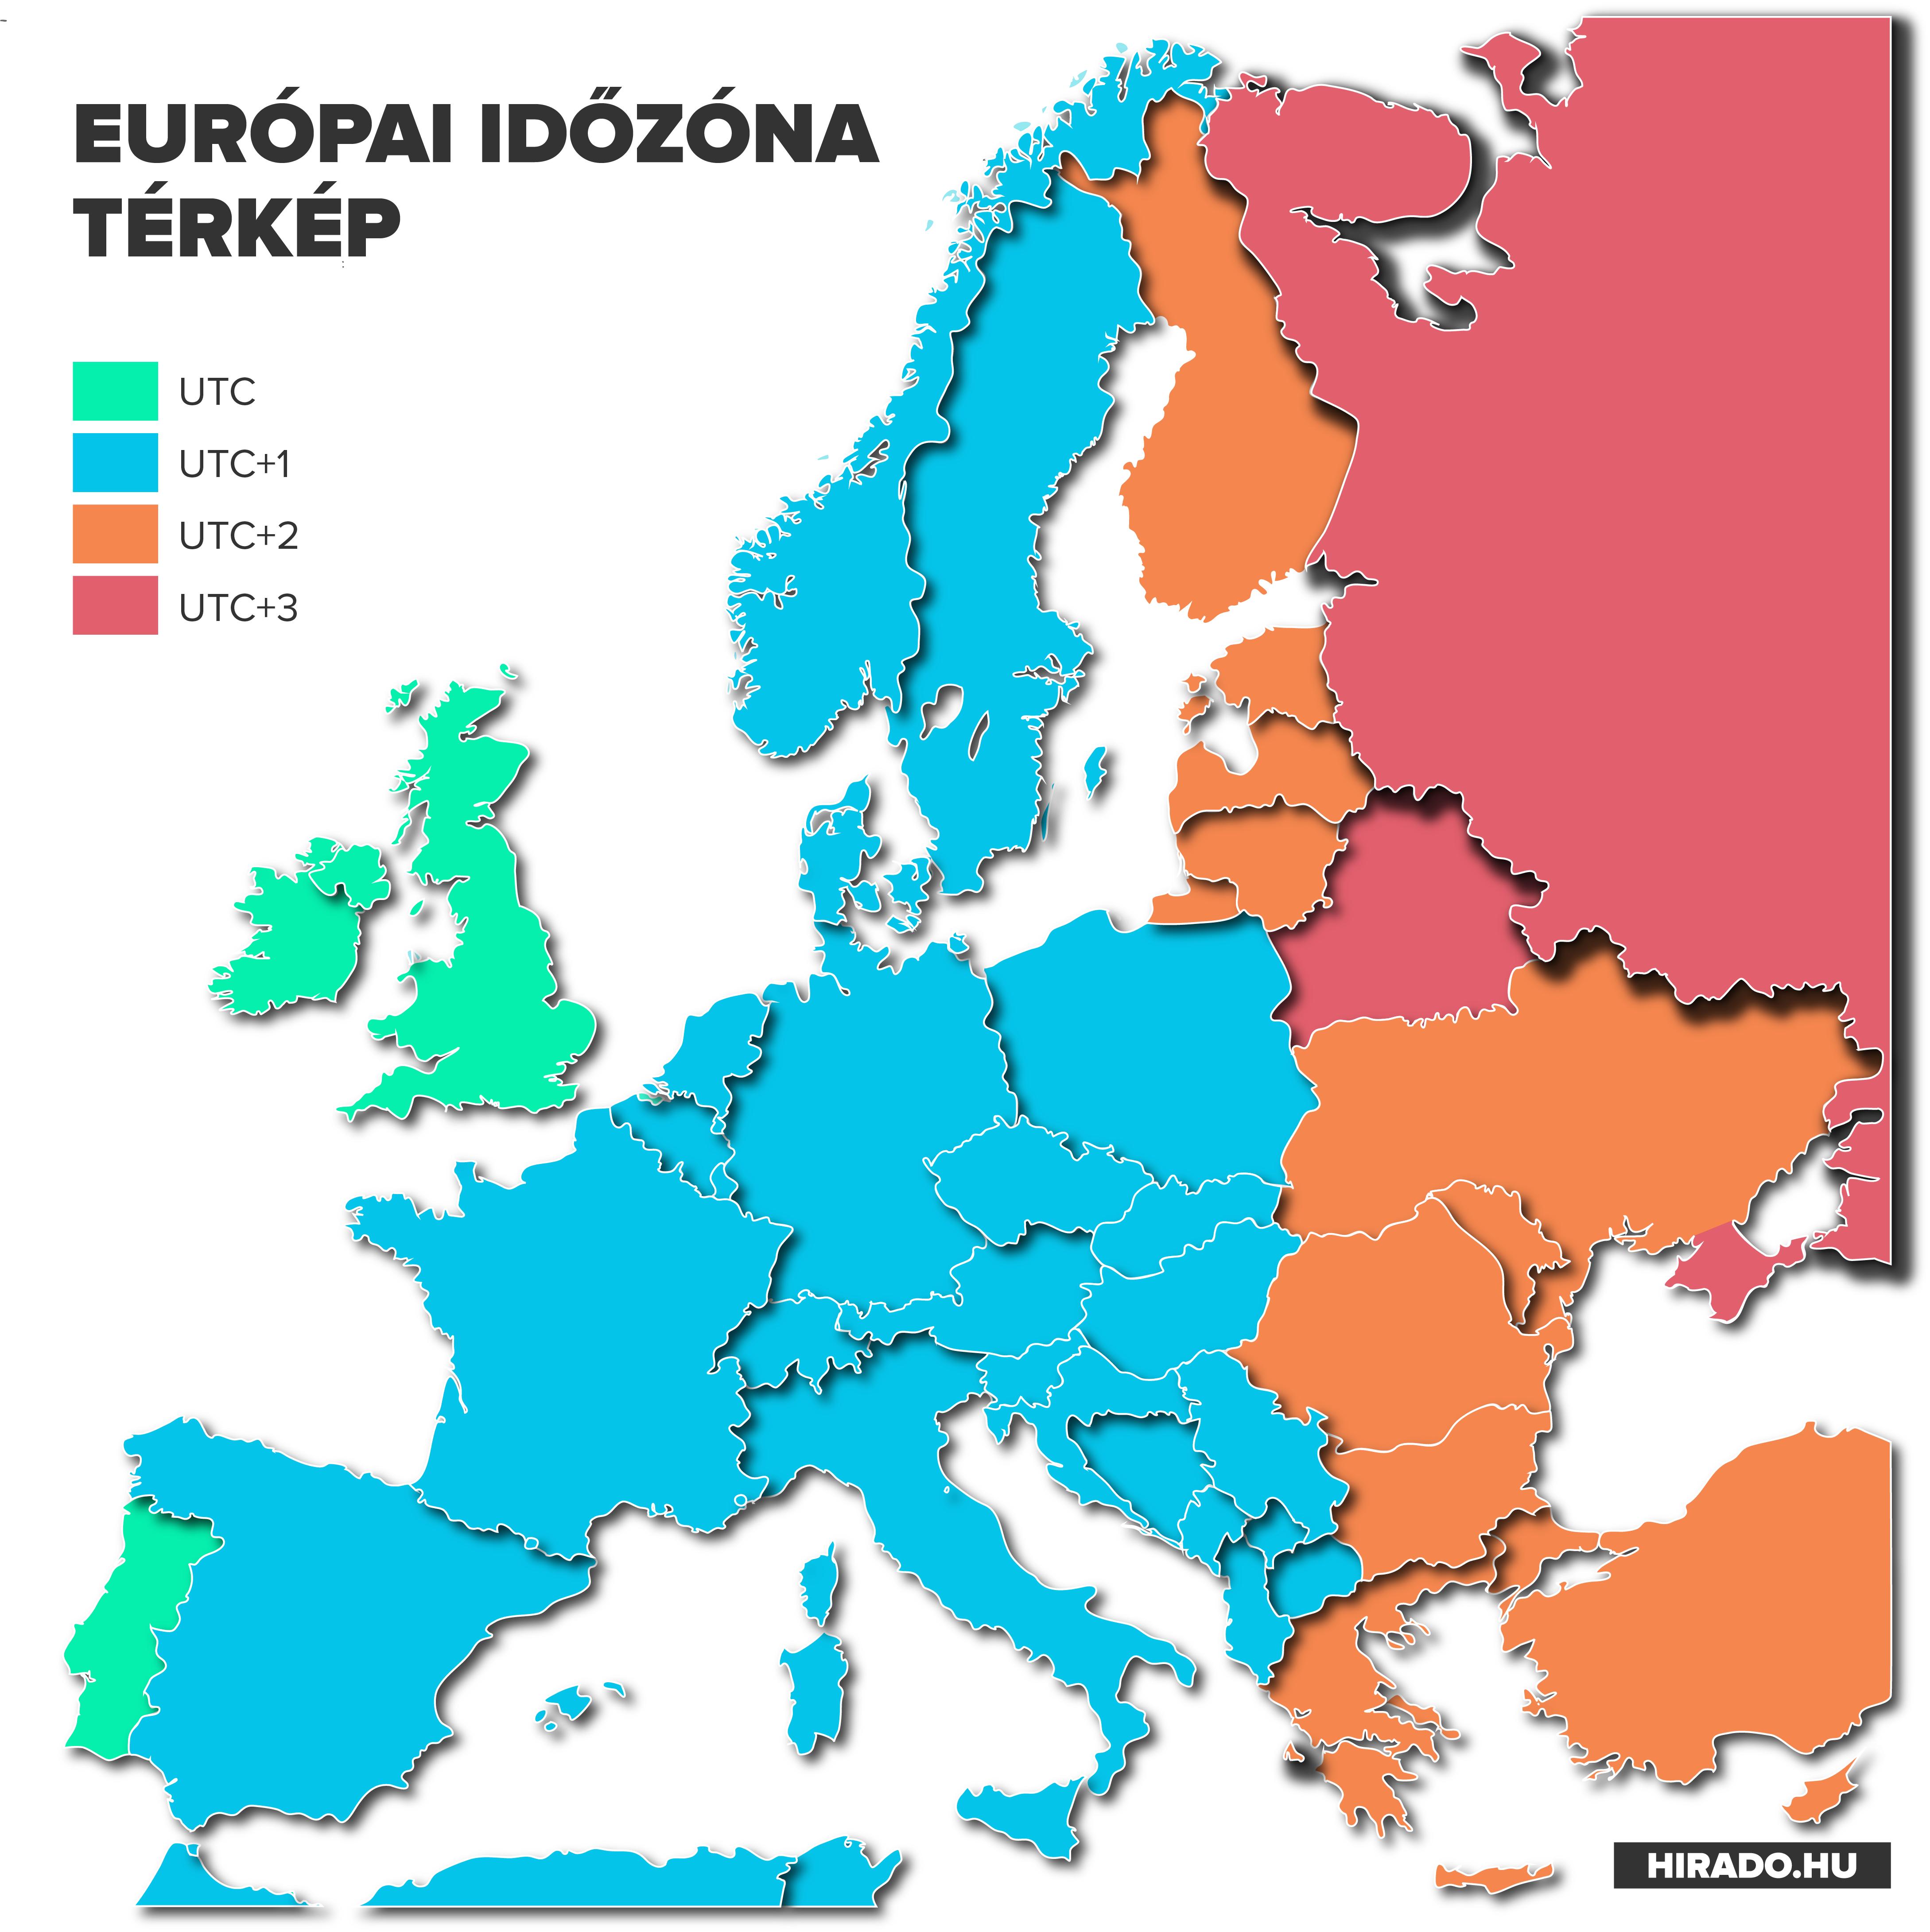 europai_idozonak-idozona